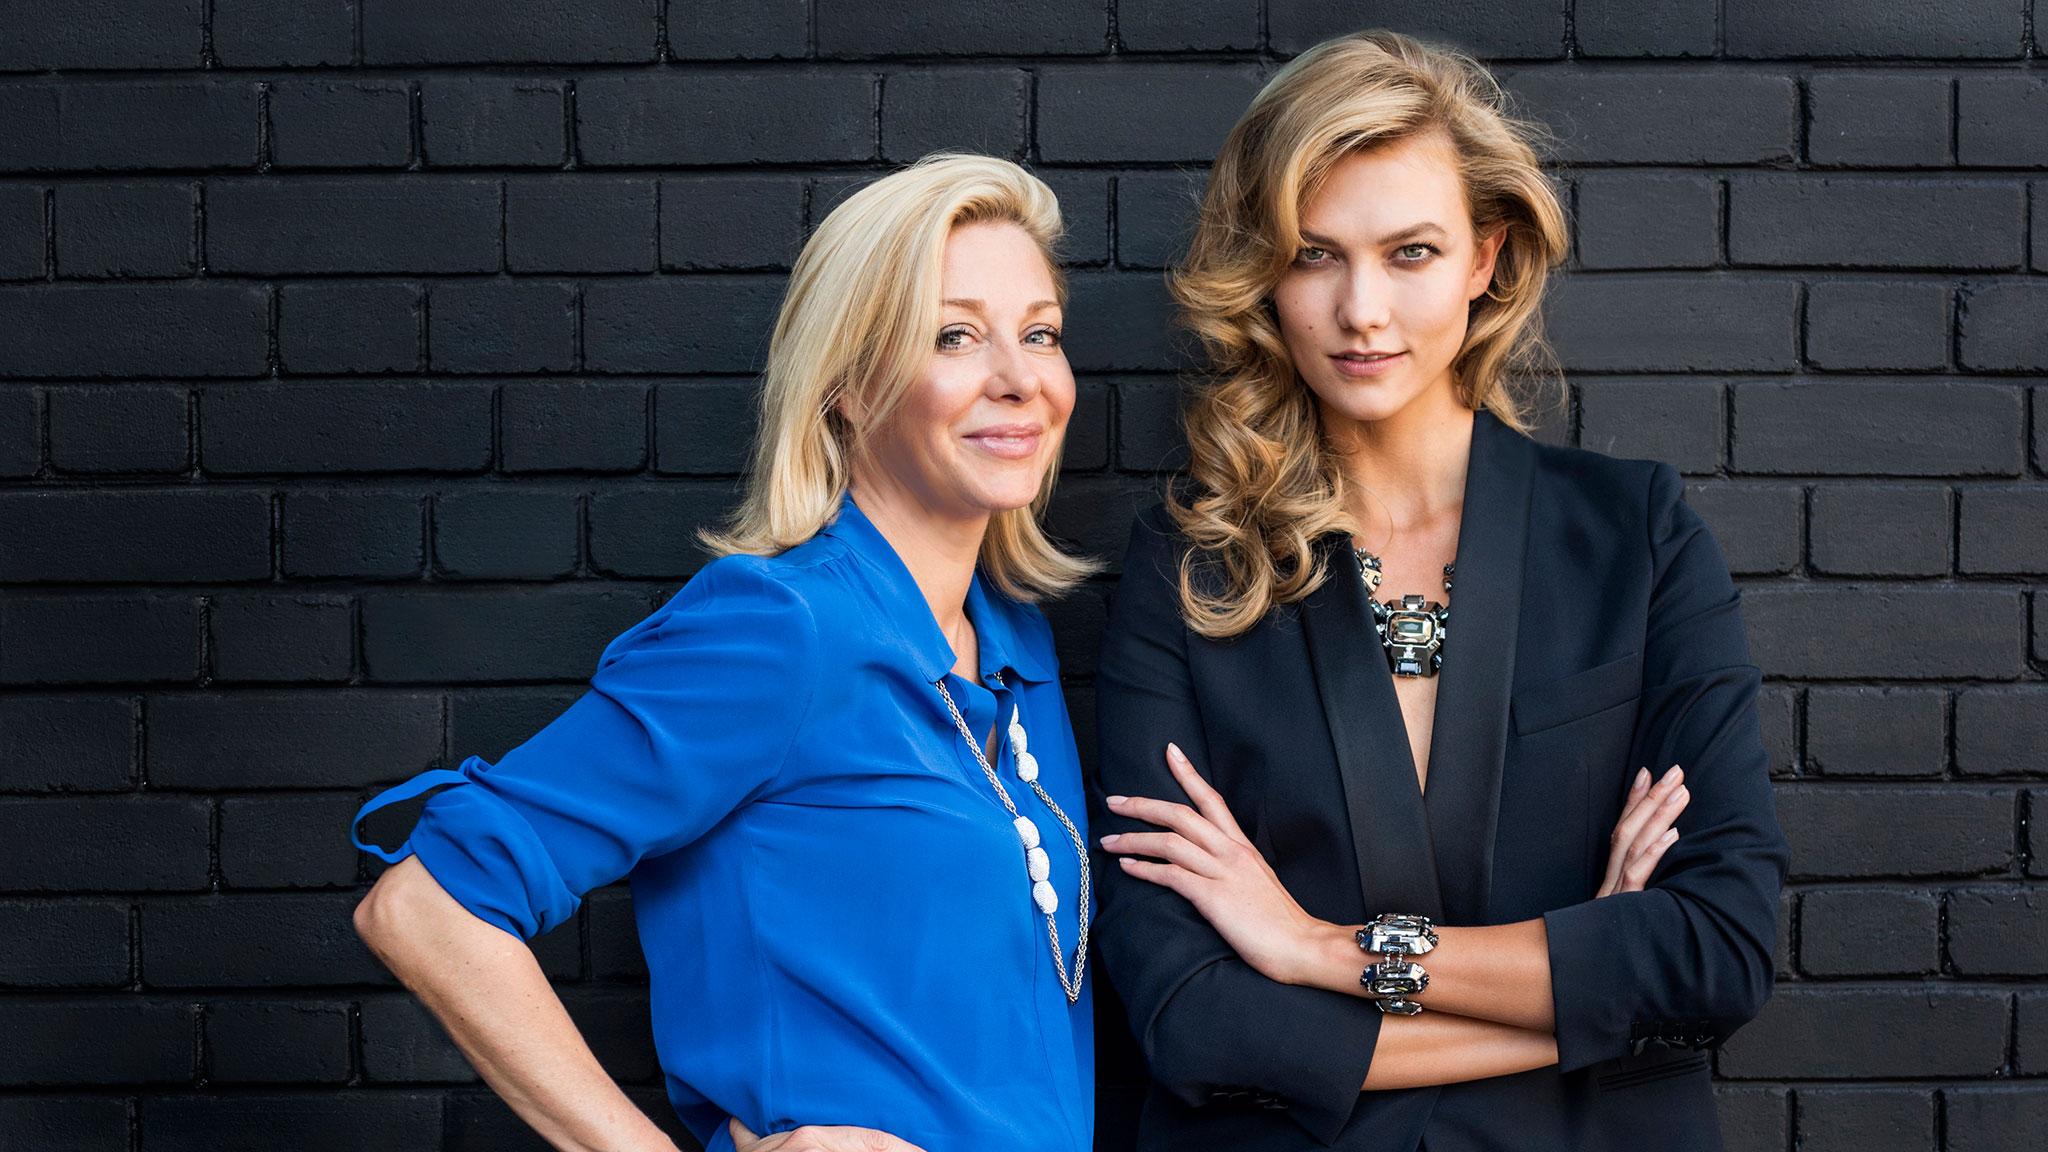 Meet Nadja Swarovski  the woman with the €2.6bn sparkle  67a6e43ecb